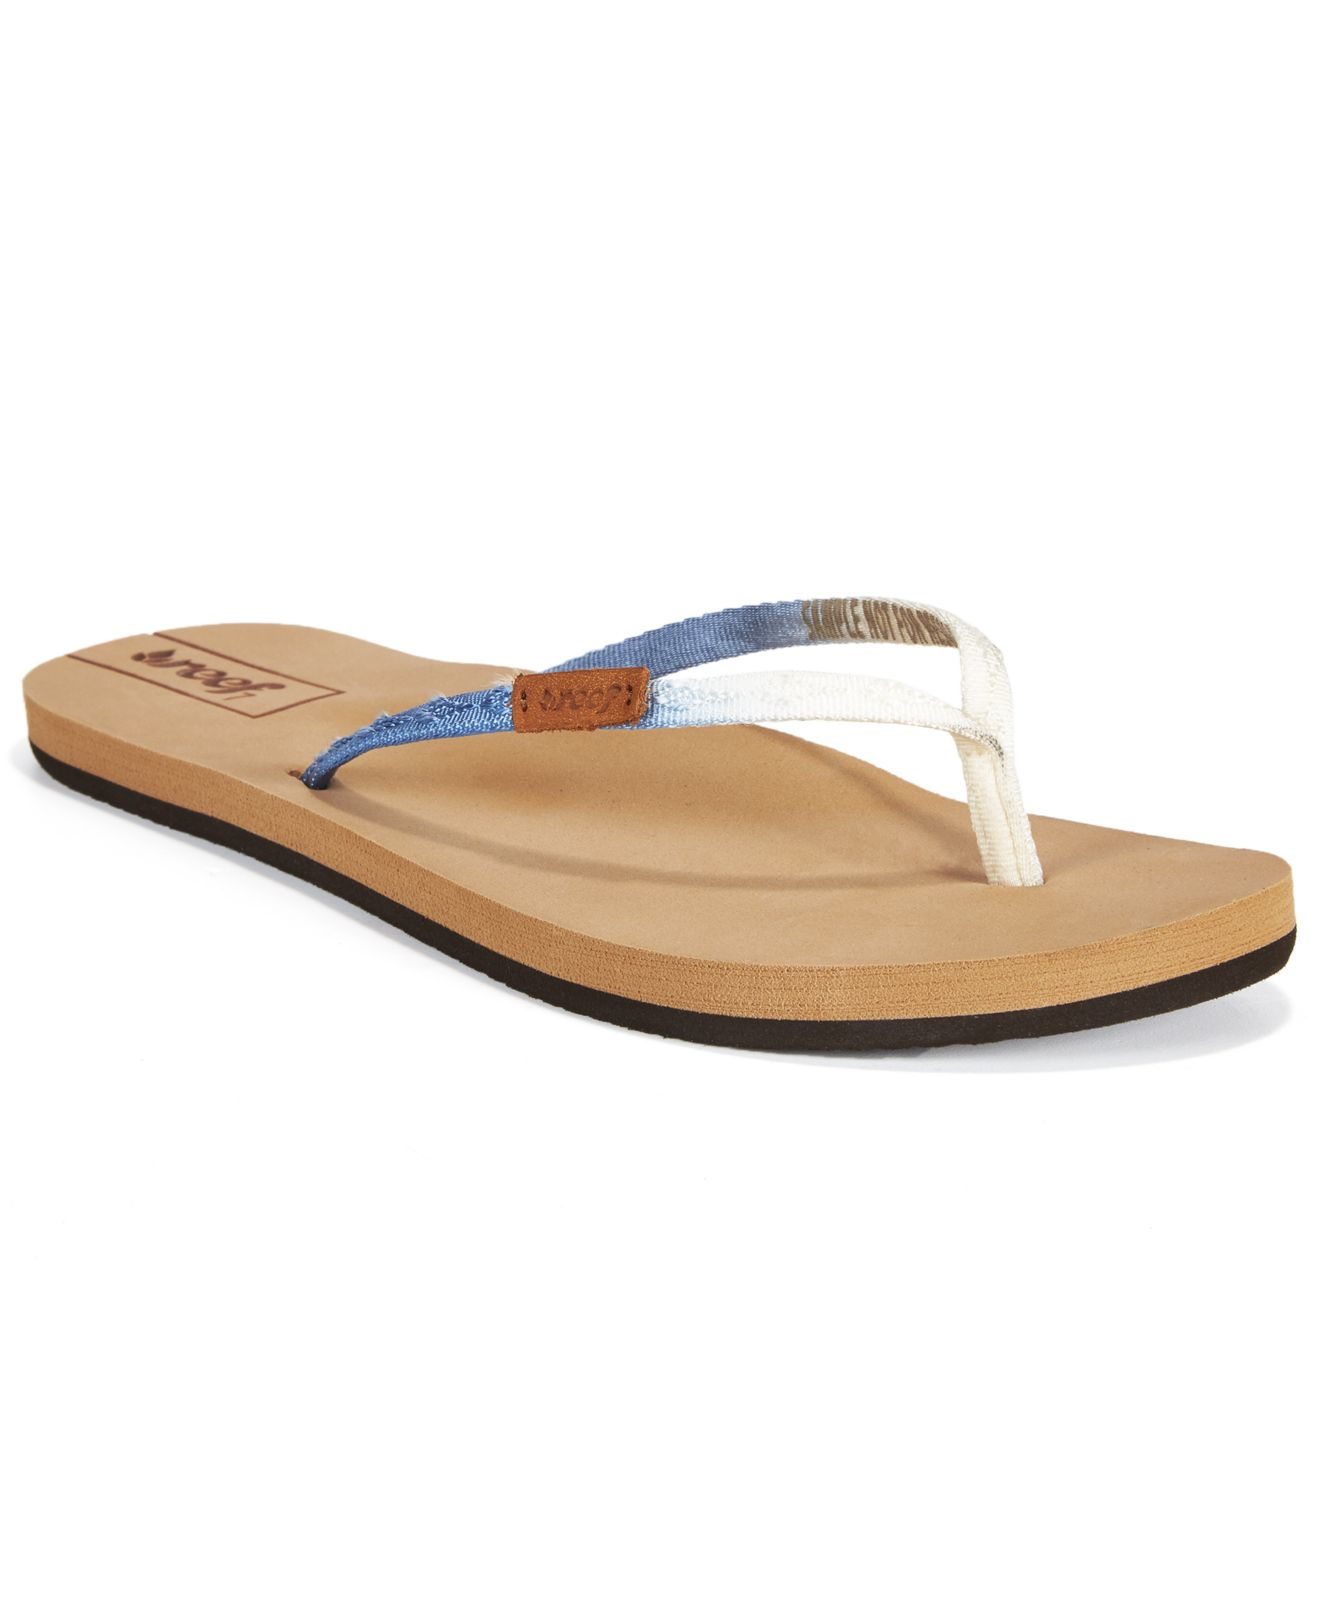 040250a63ba9 Lyst - Reef Slim Ginger Ombre Thong Flip Flops in Blue